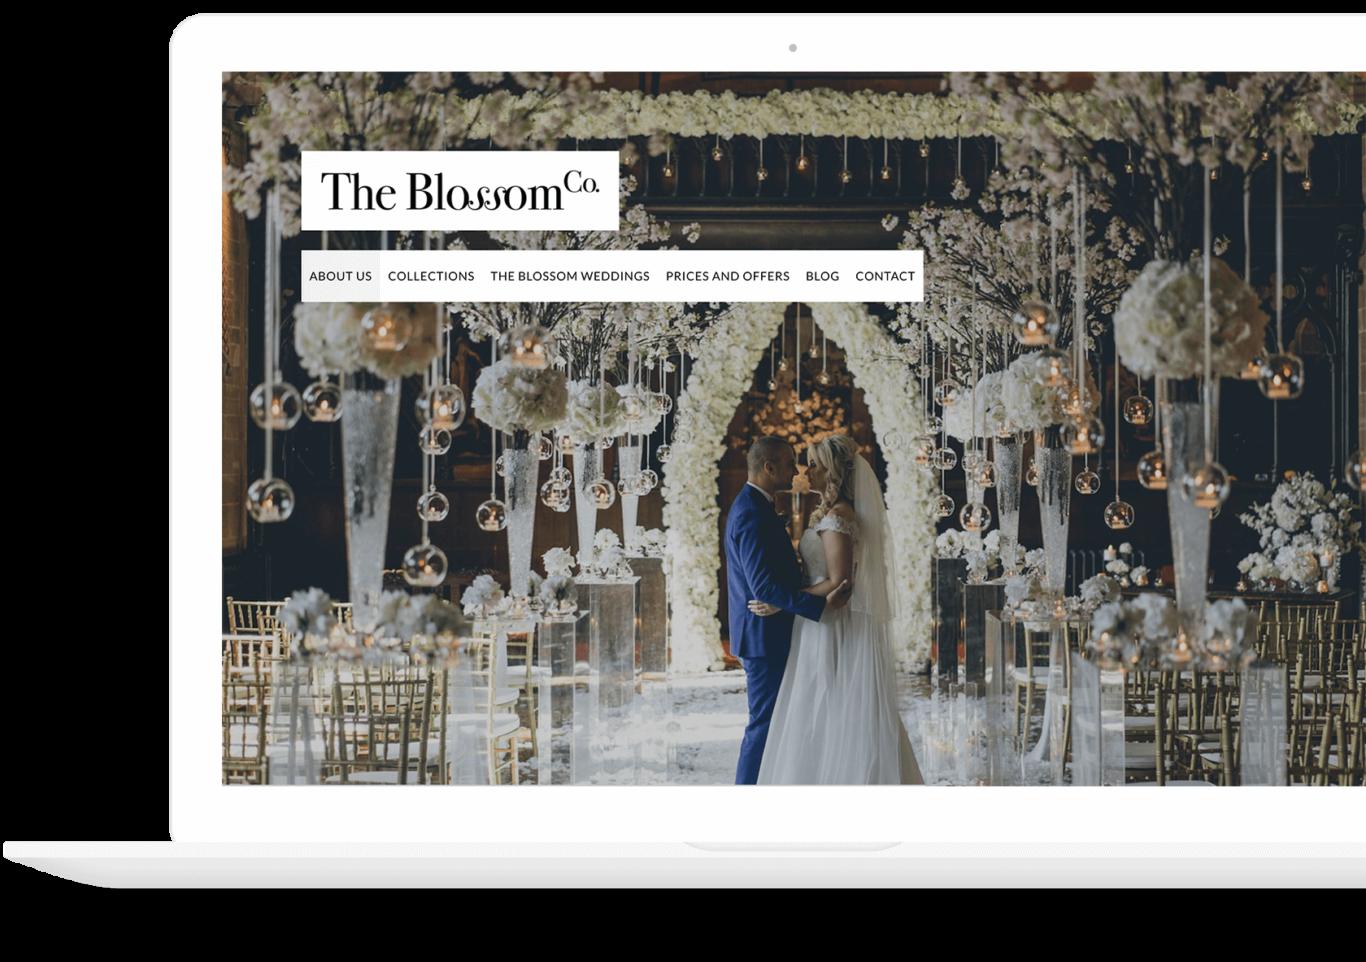 The Blossom Co.